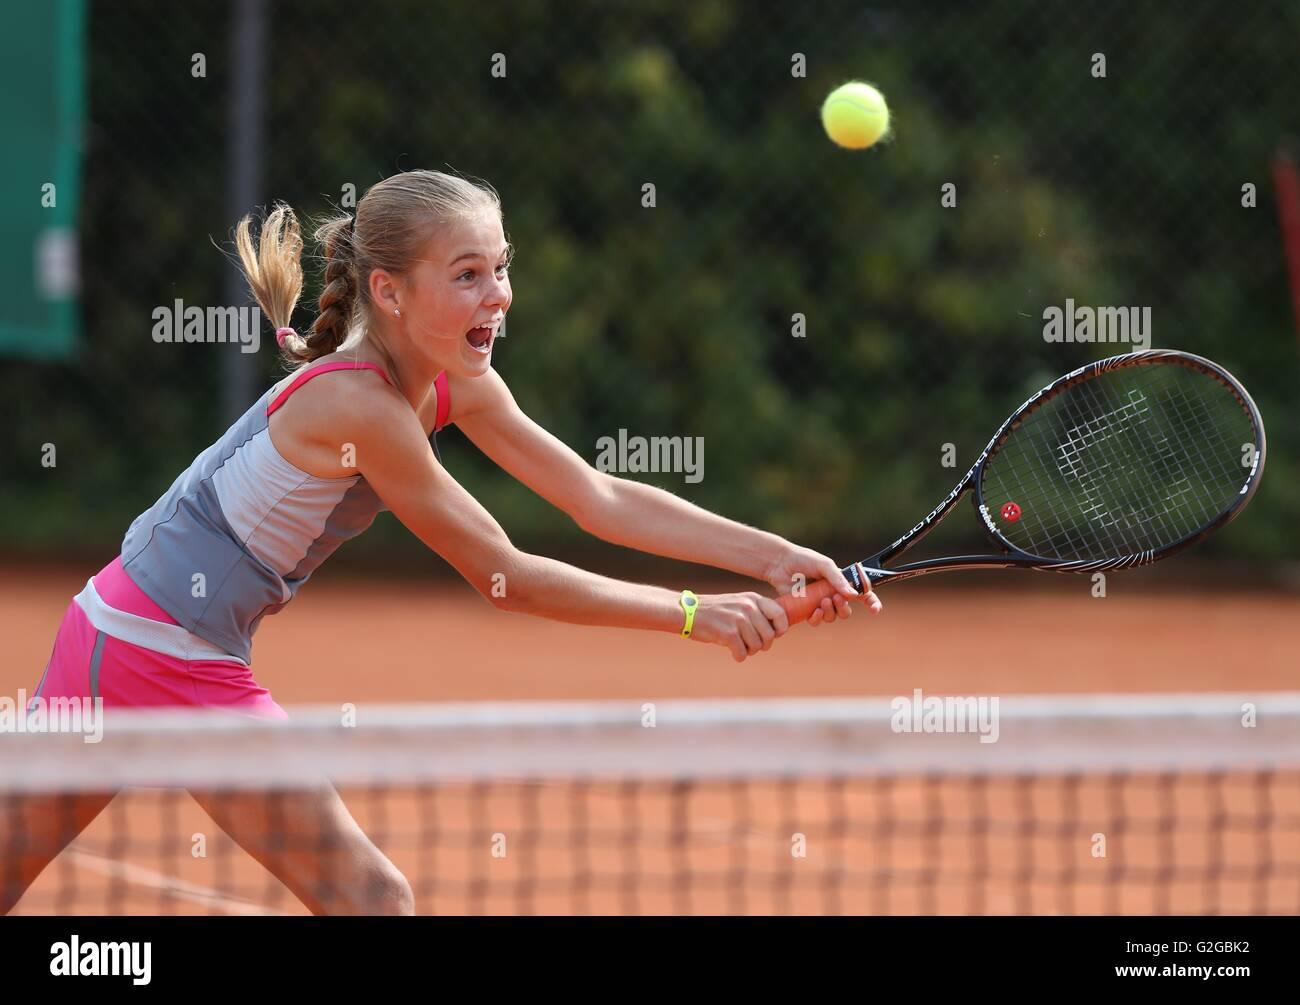 Girl, 11, playing tennis, hitting a backhand volley, Munich, Upper Bavaria, Bavaria, Germany - Stock Image